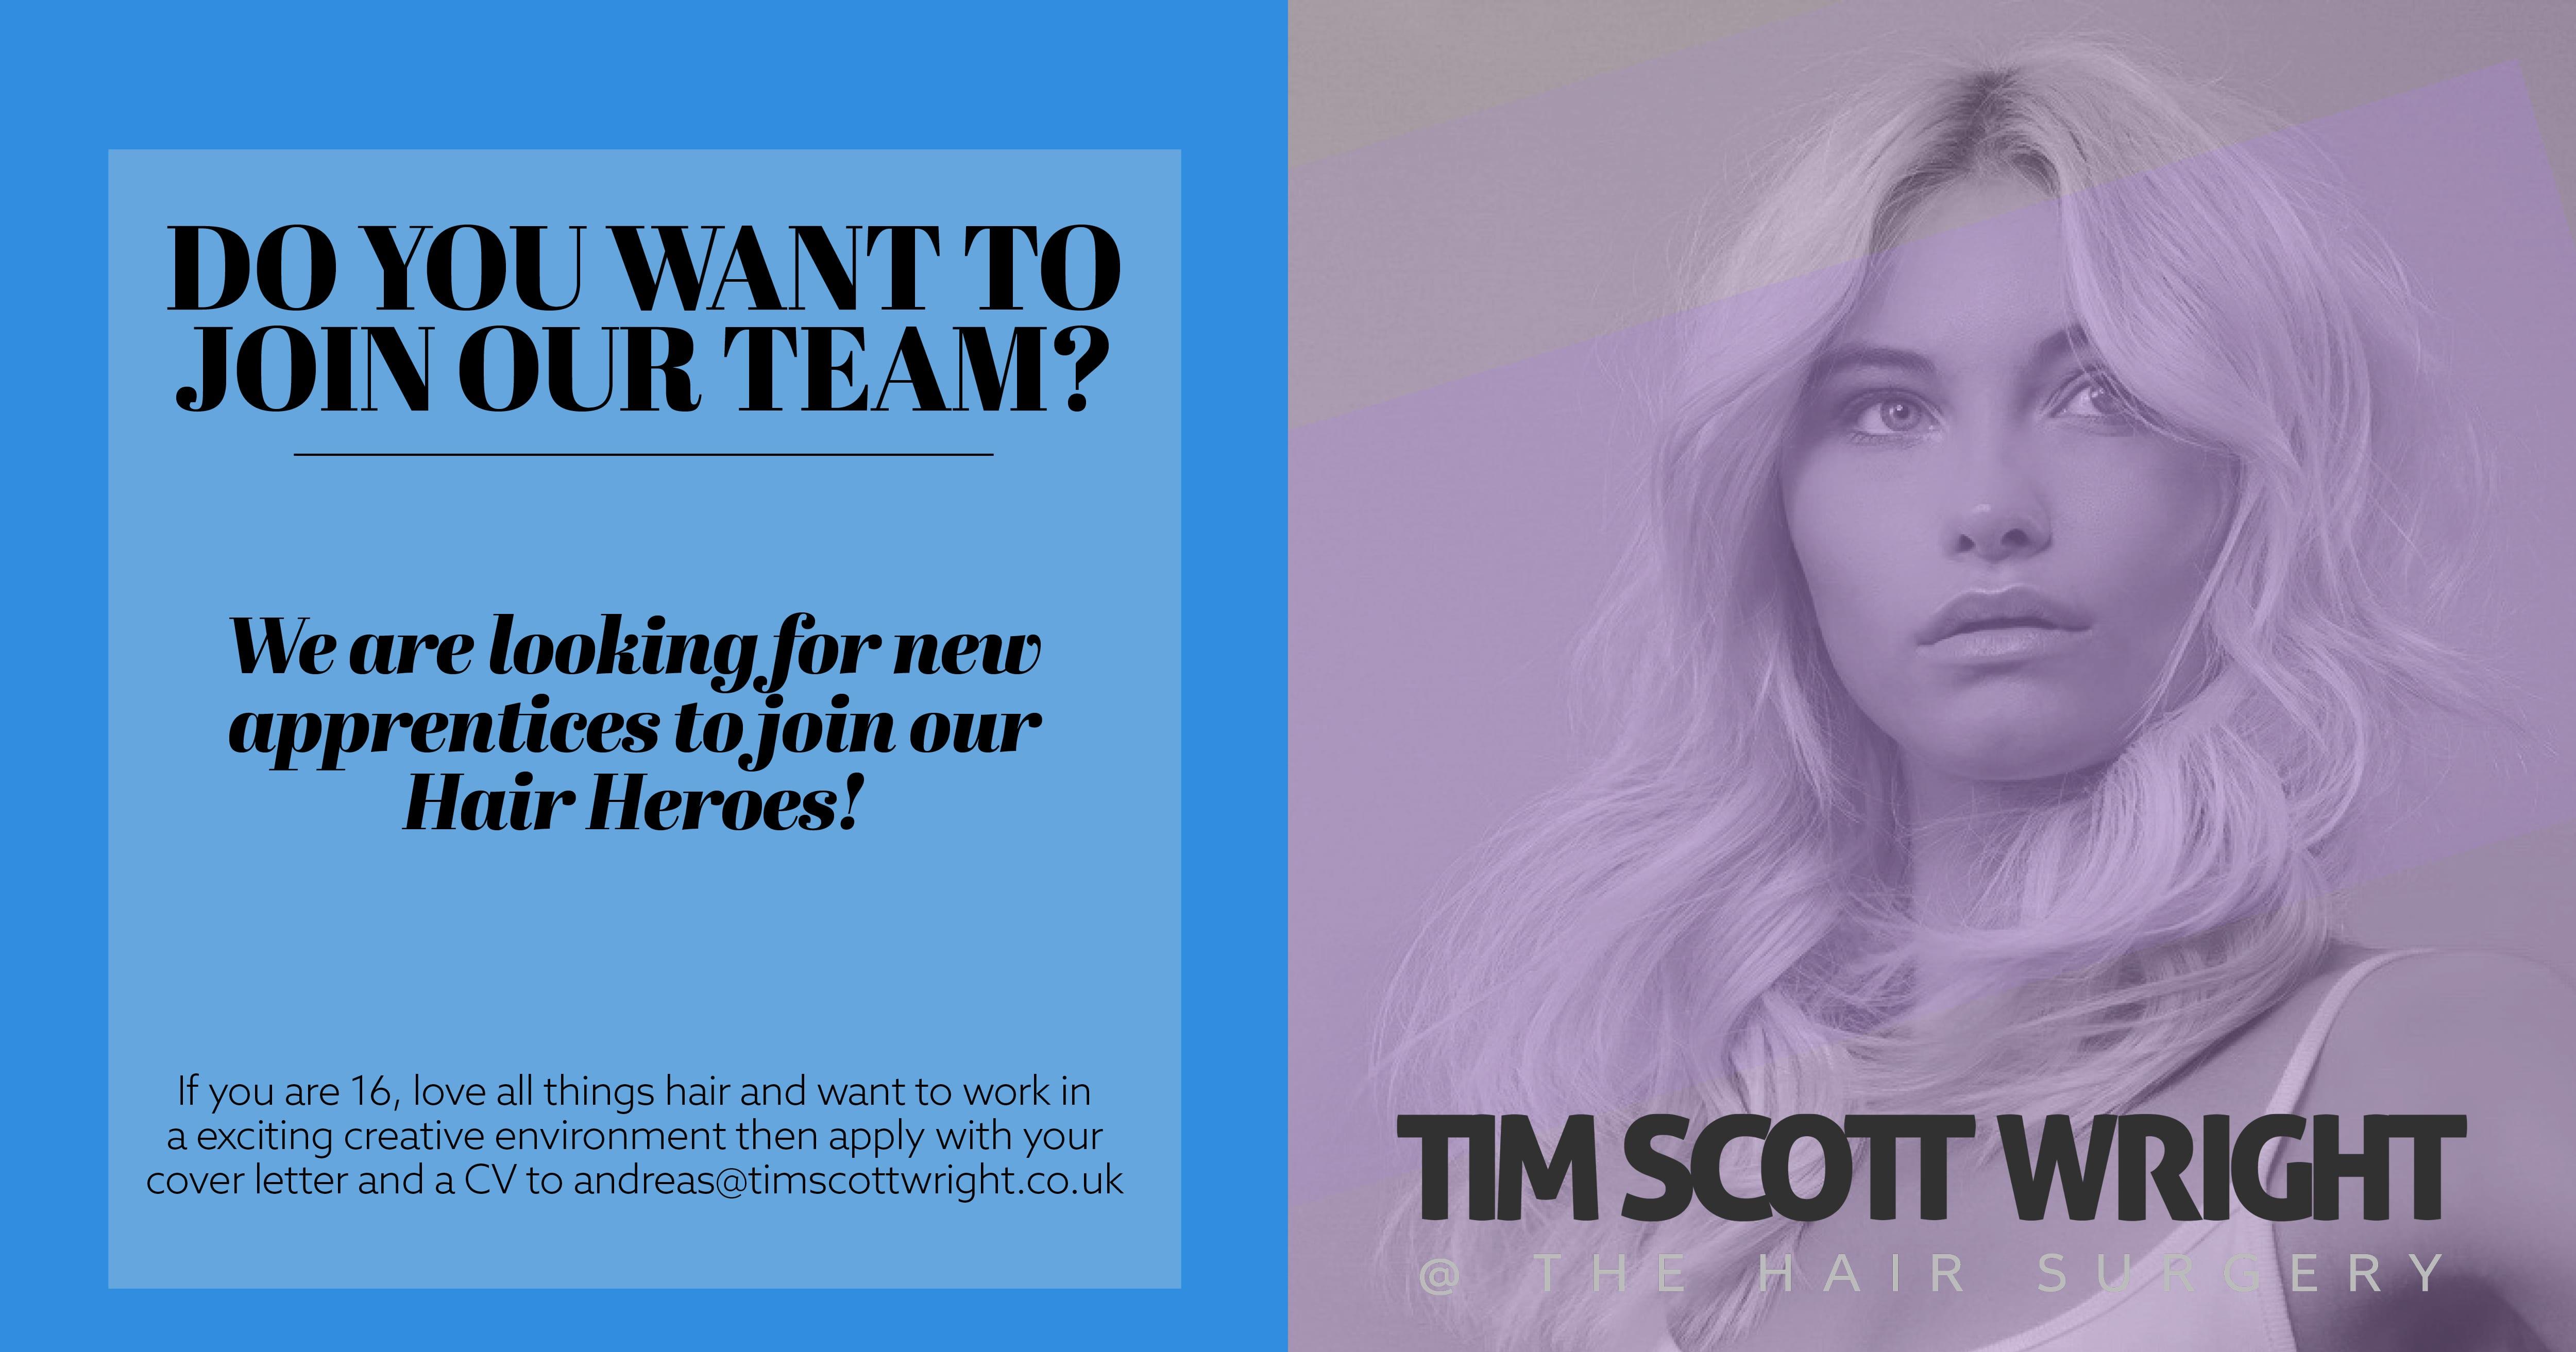 Tim Scott,Wright , Award Winning Hair Stylist , TimScott